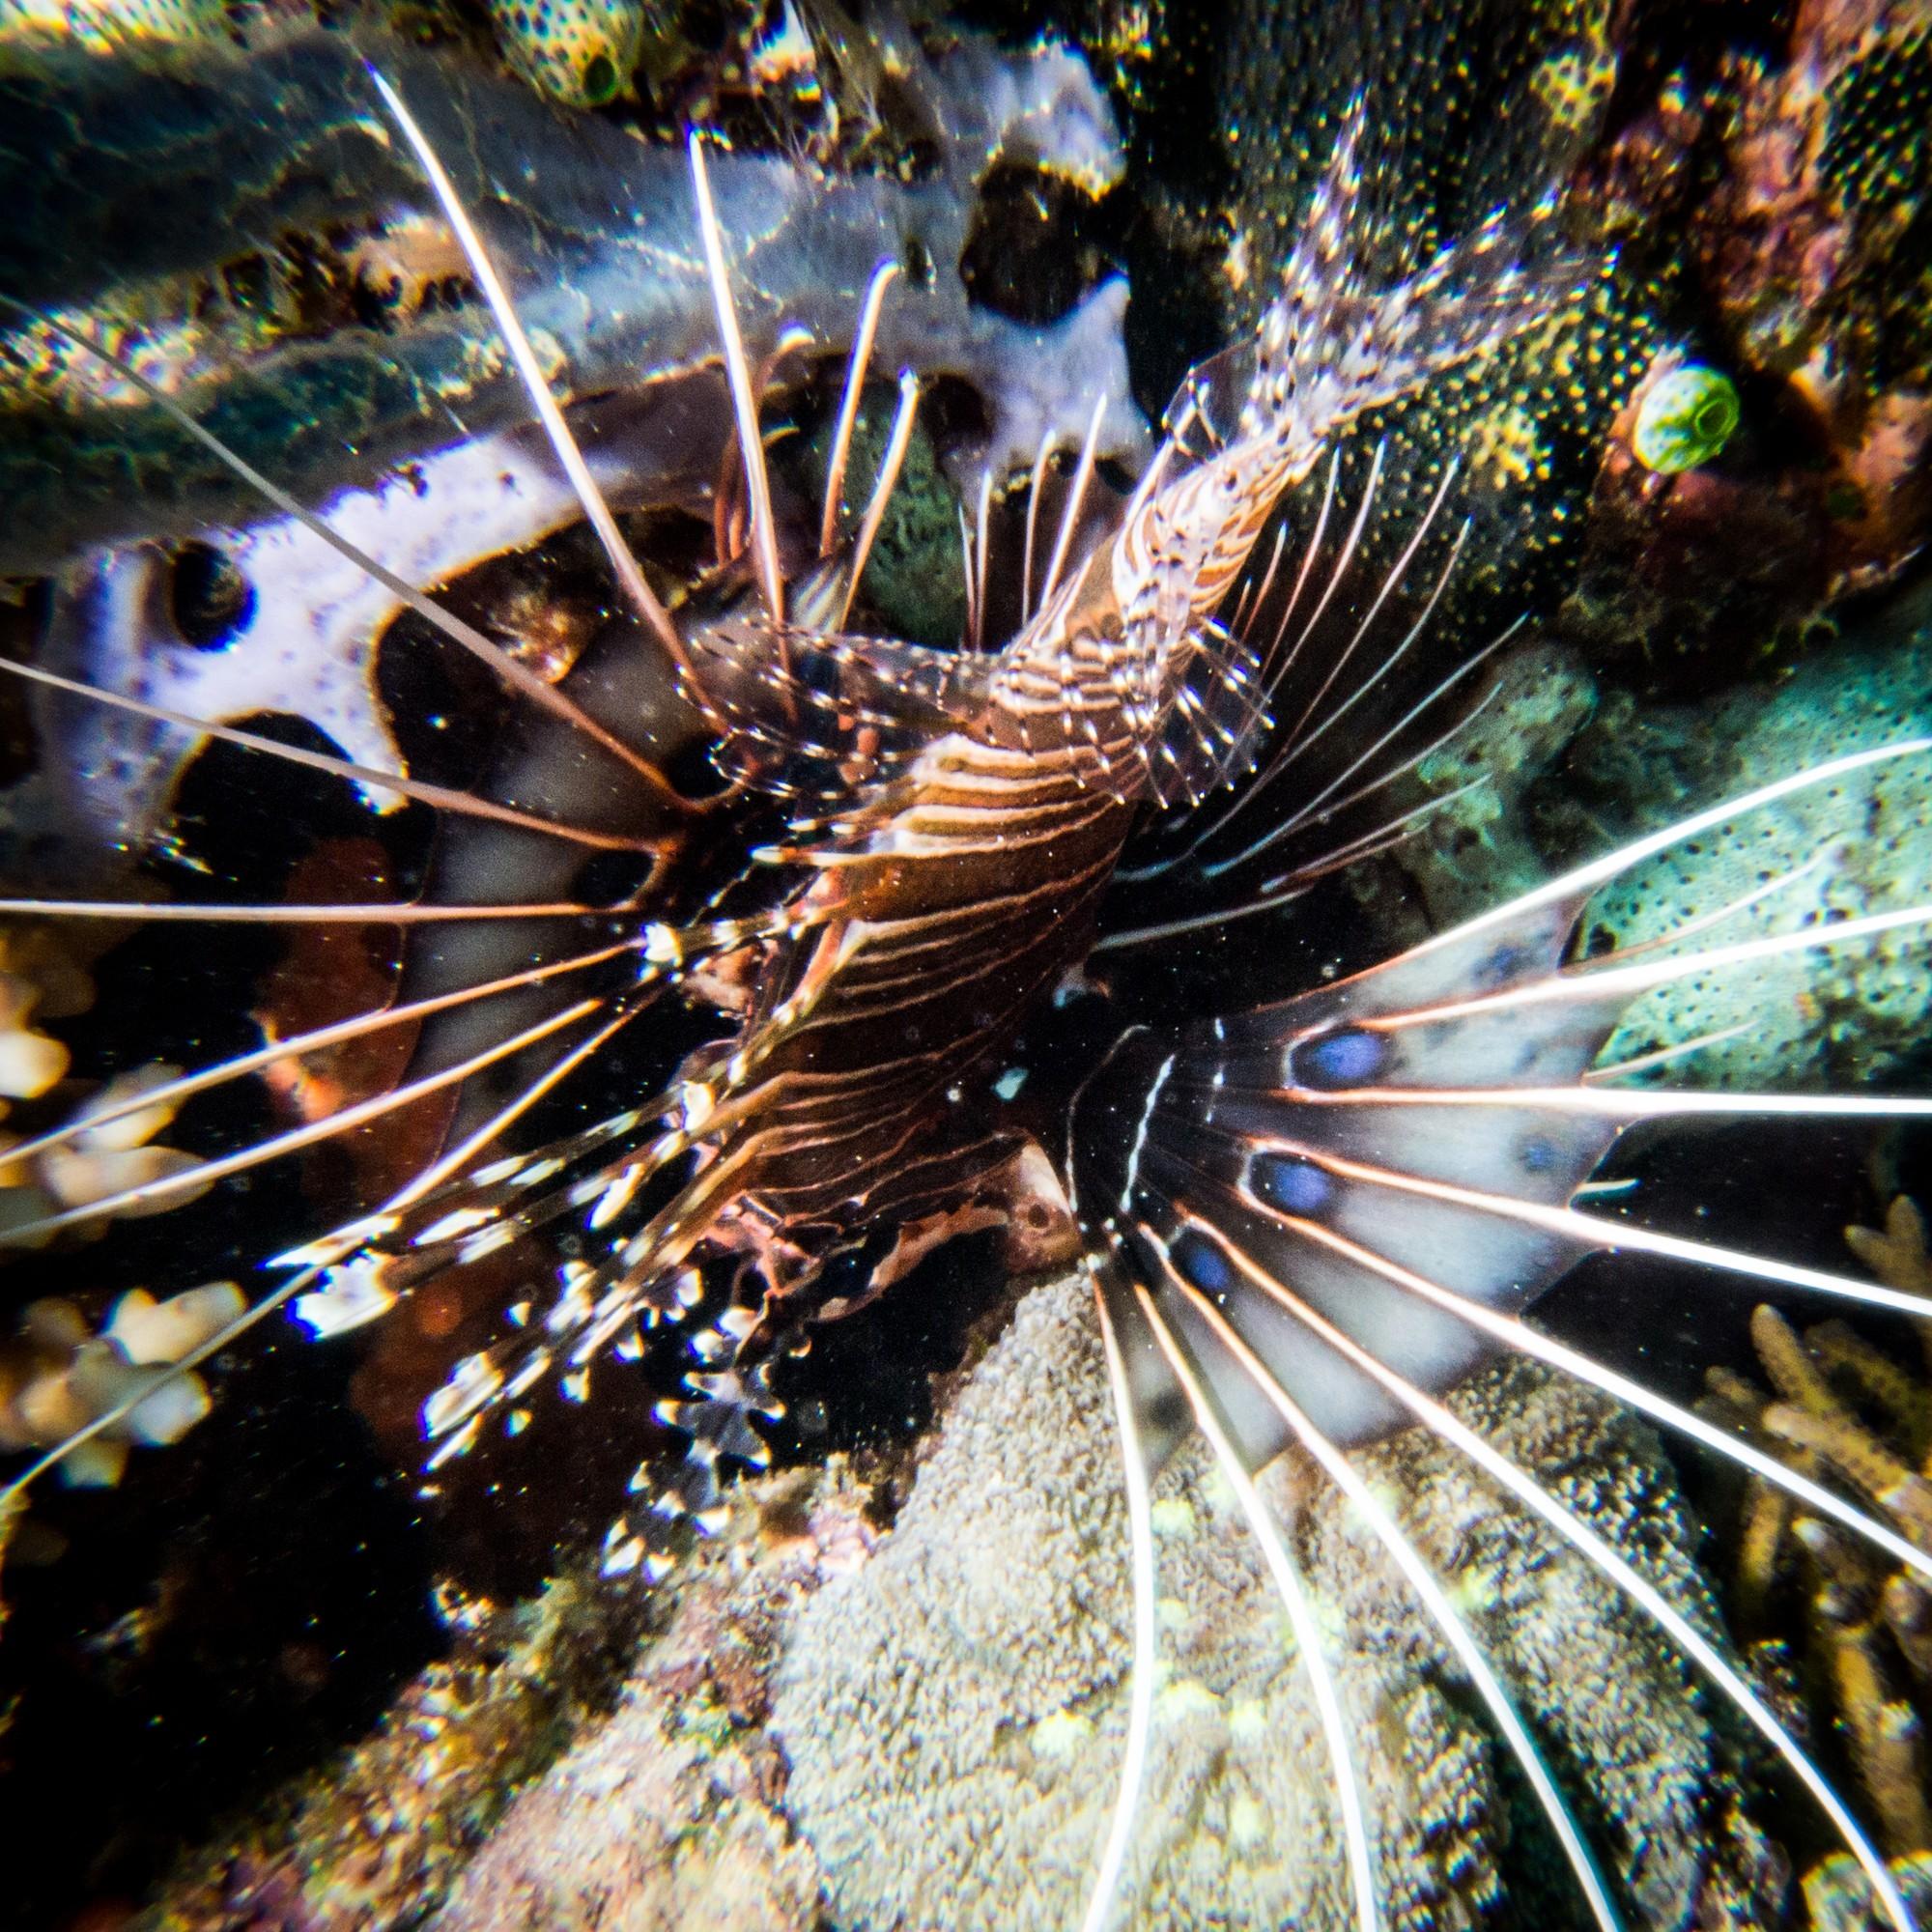 Waiterang wreck dive site Maumere scorpion fish